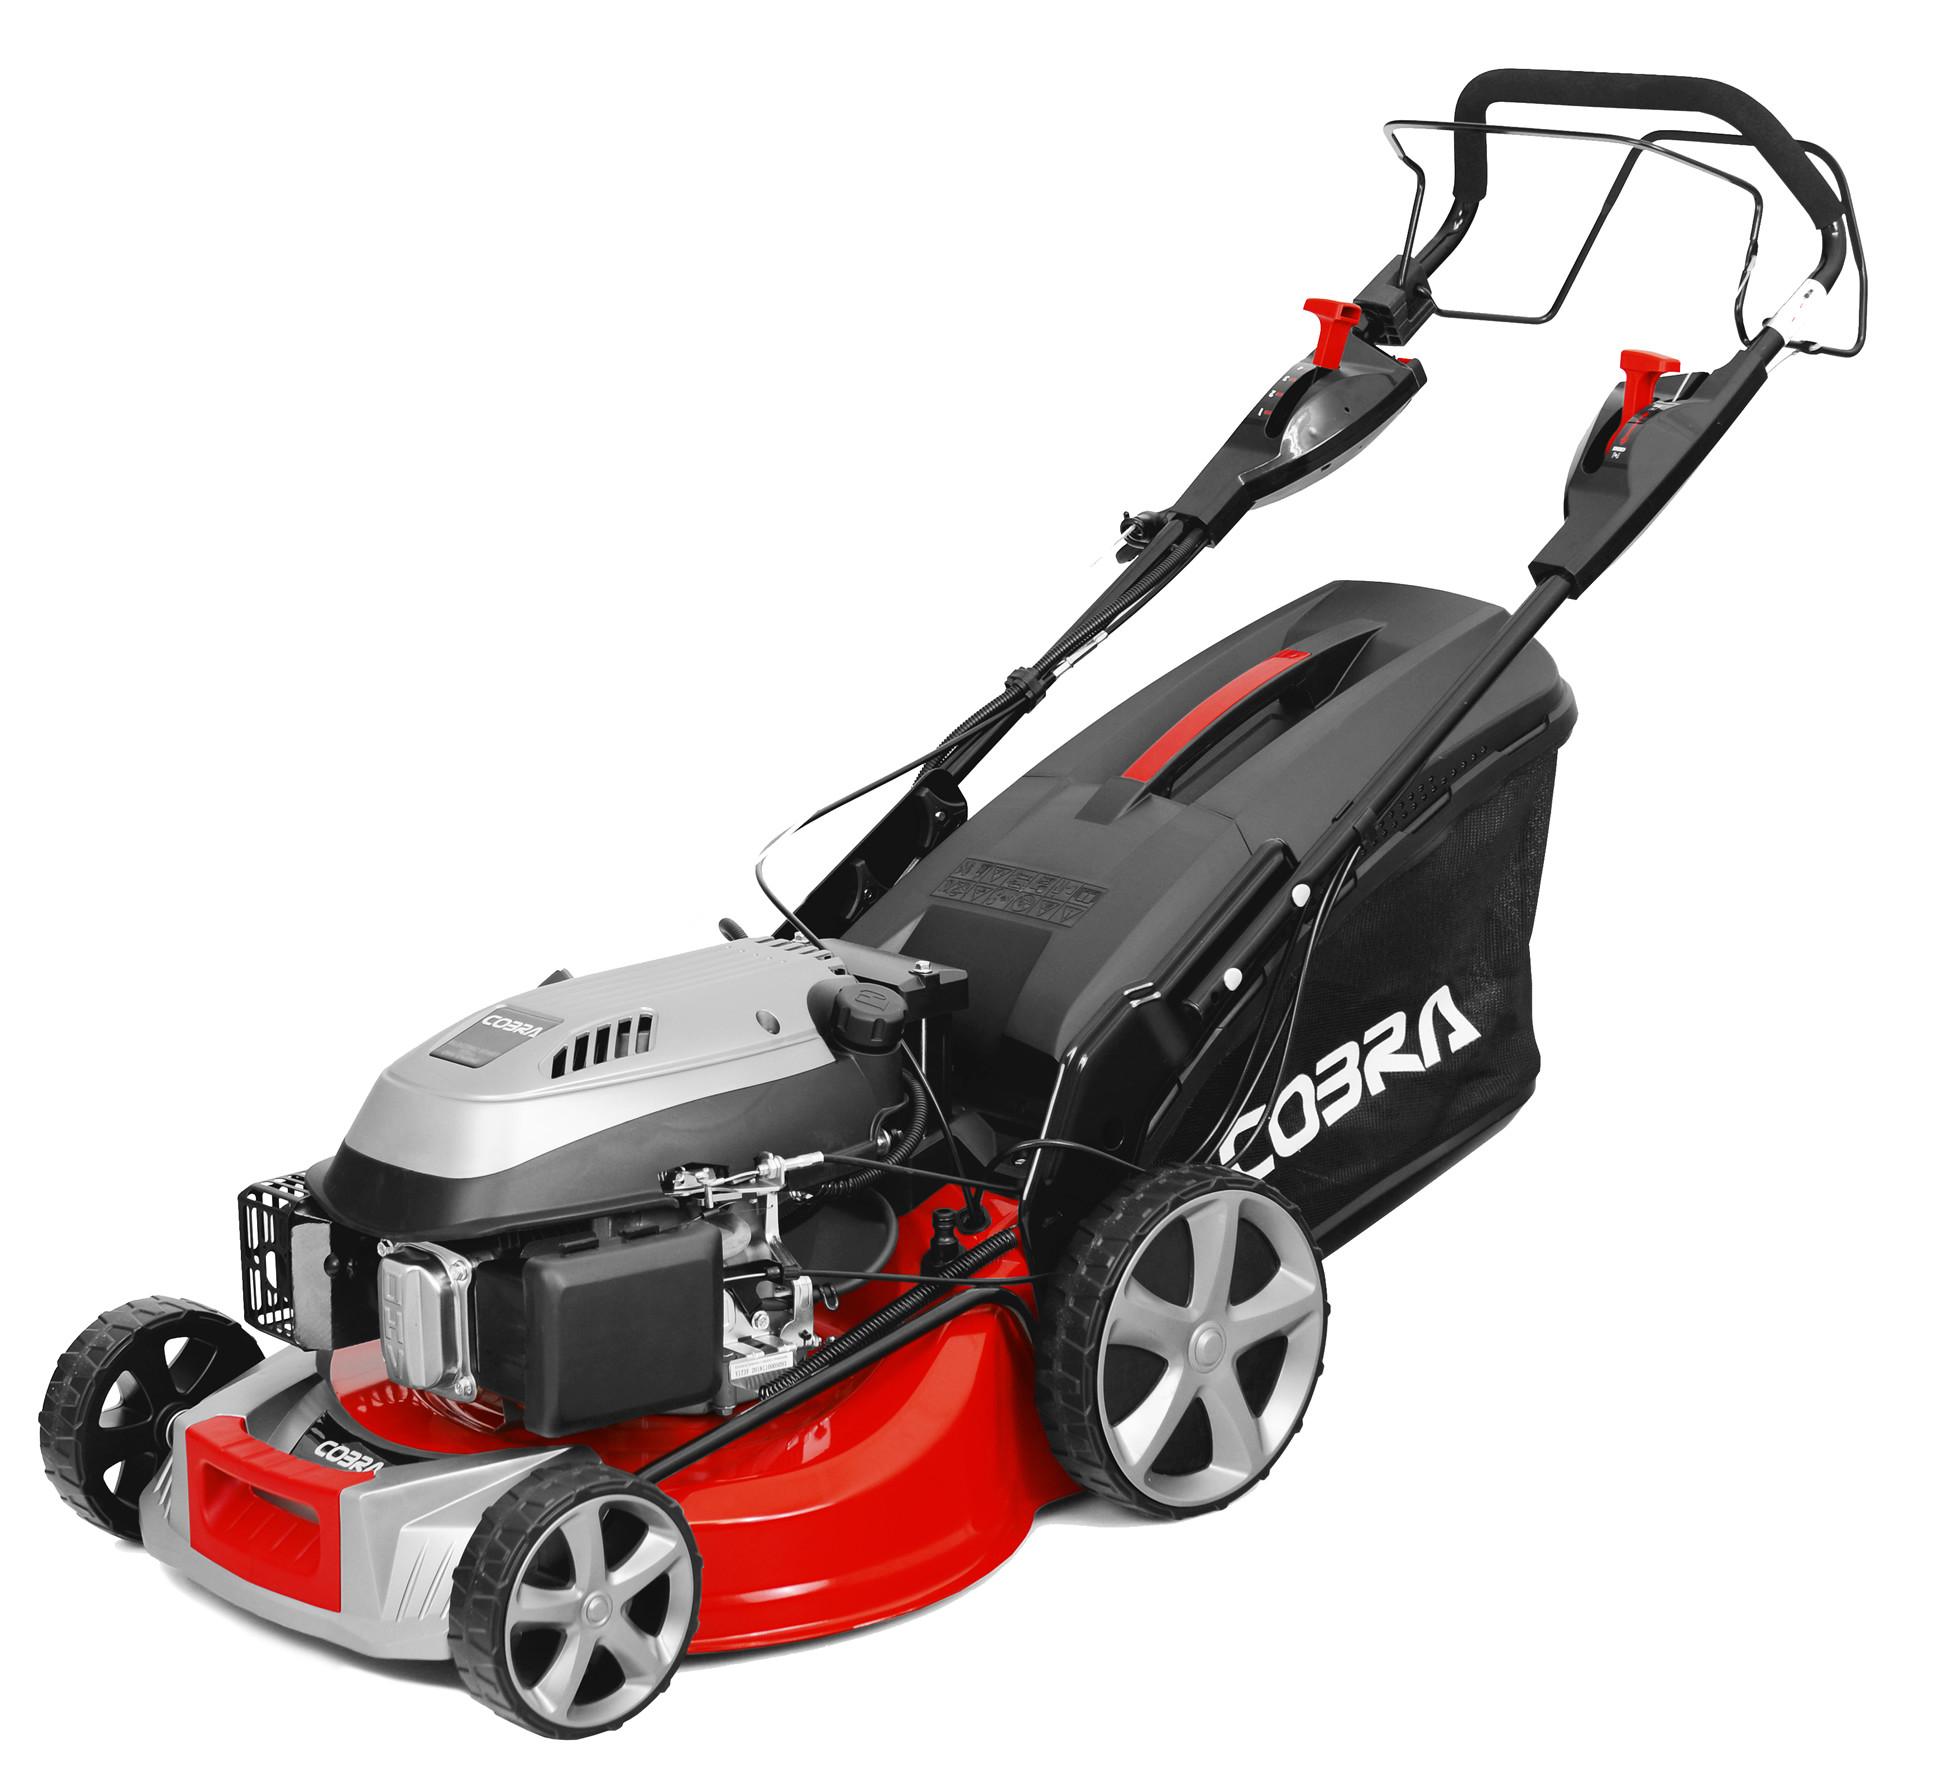 "Cobra MX534SPCE 21"" Petrol Powered Lawnmower"